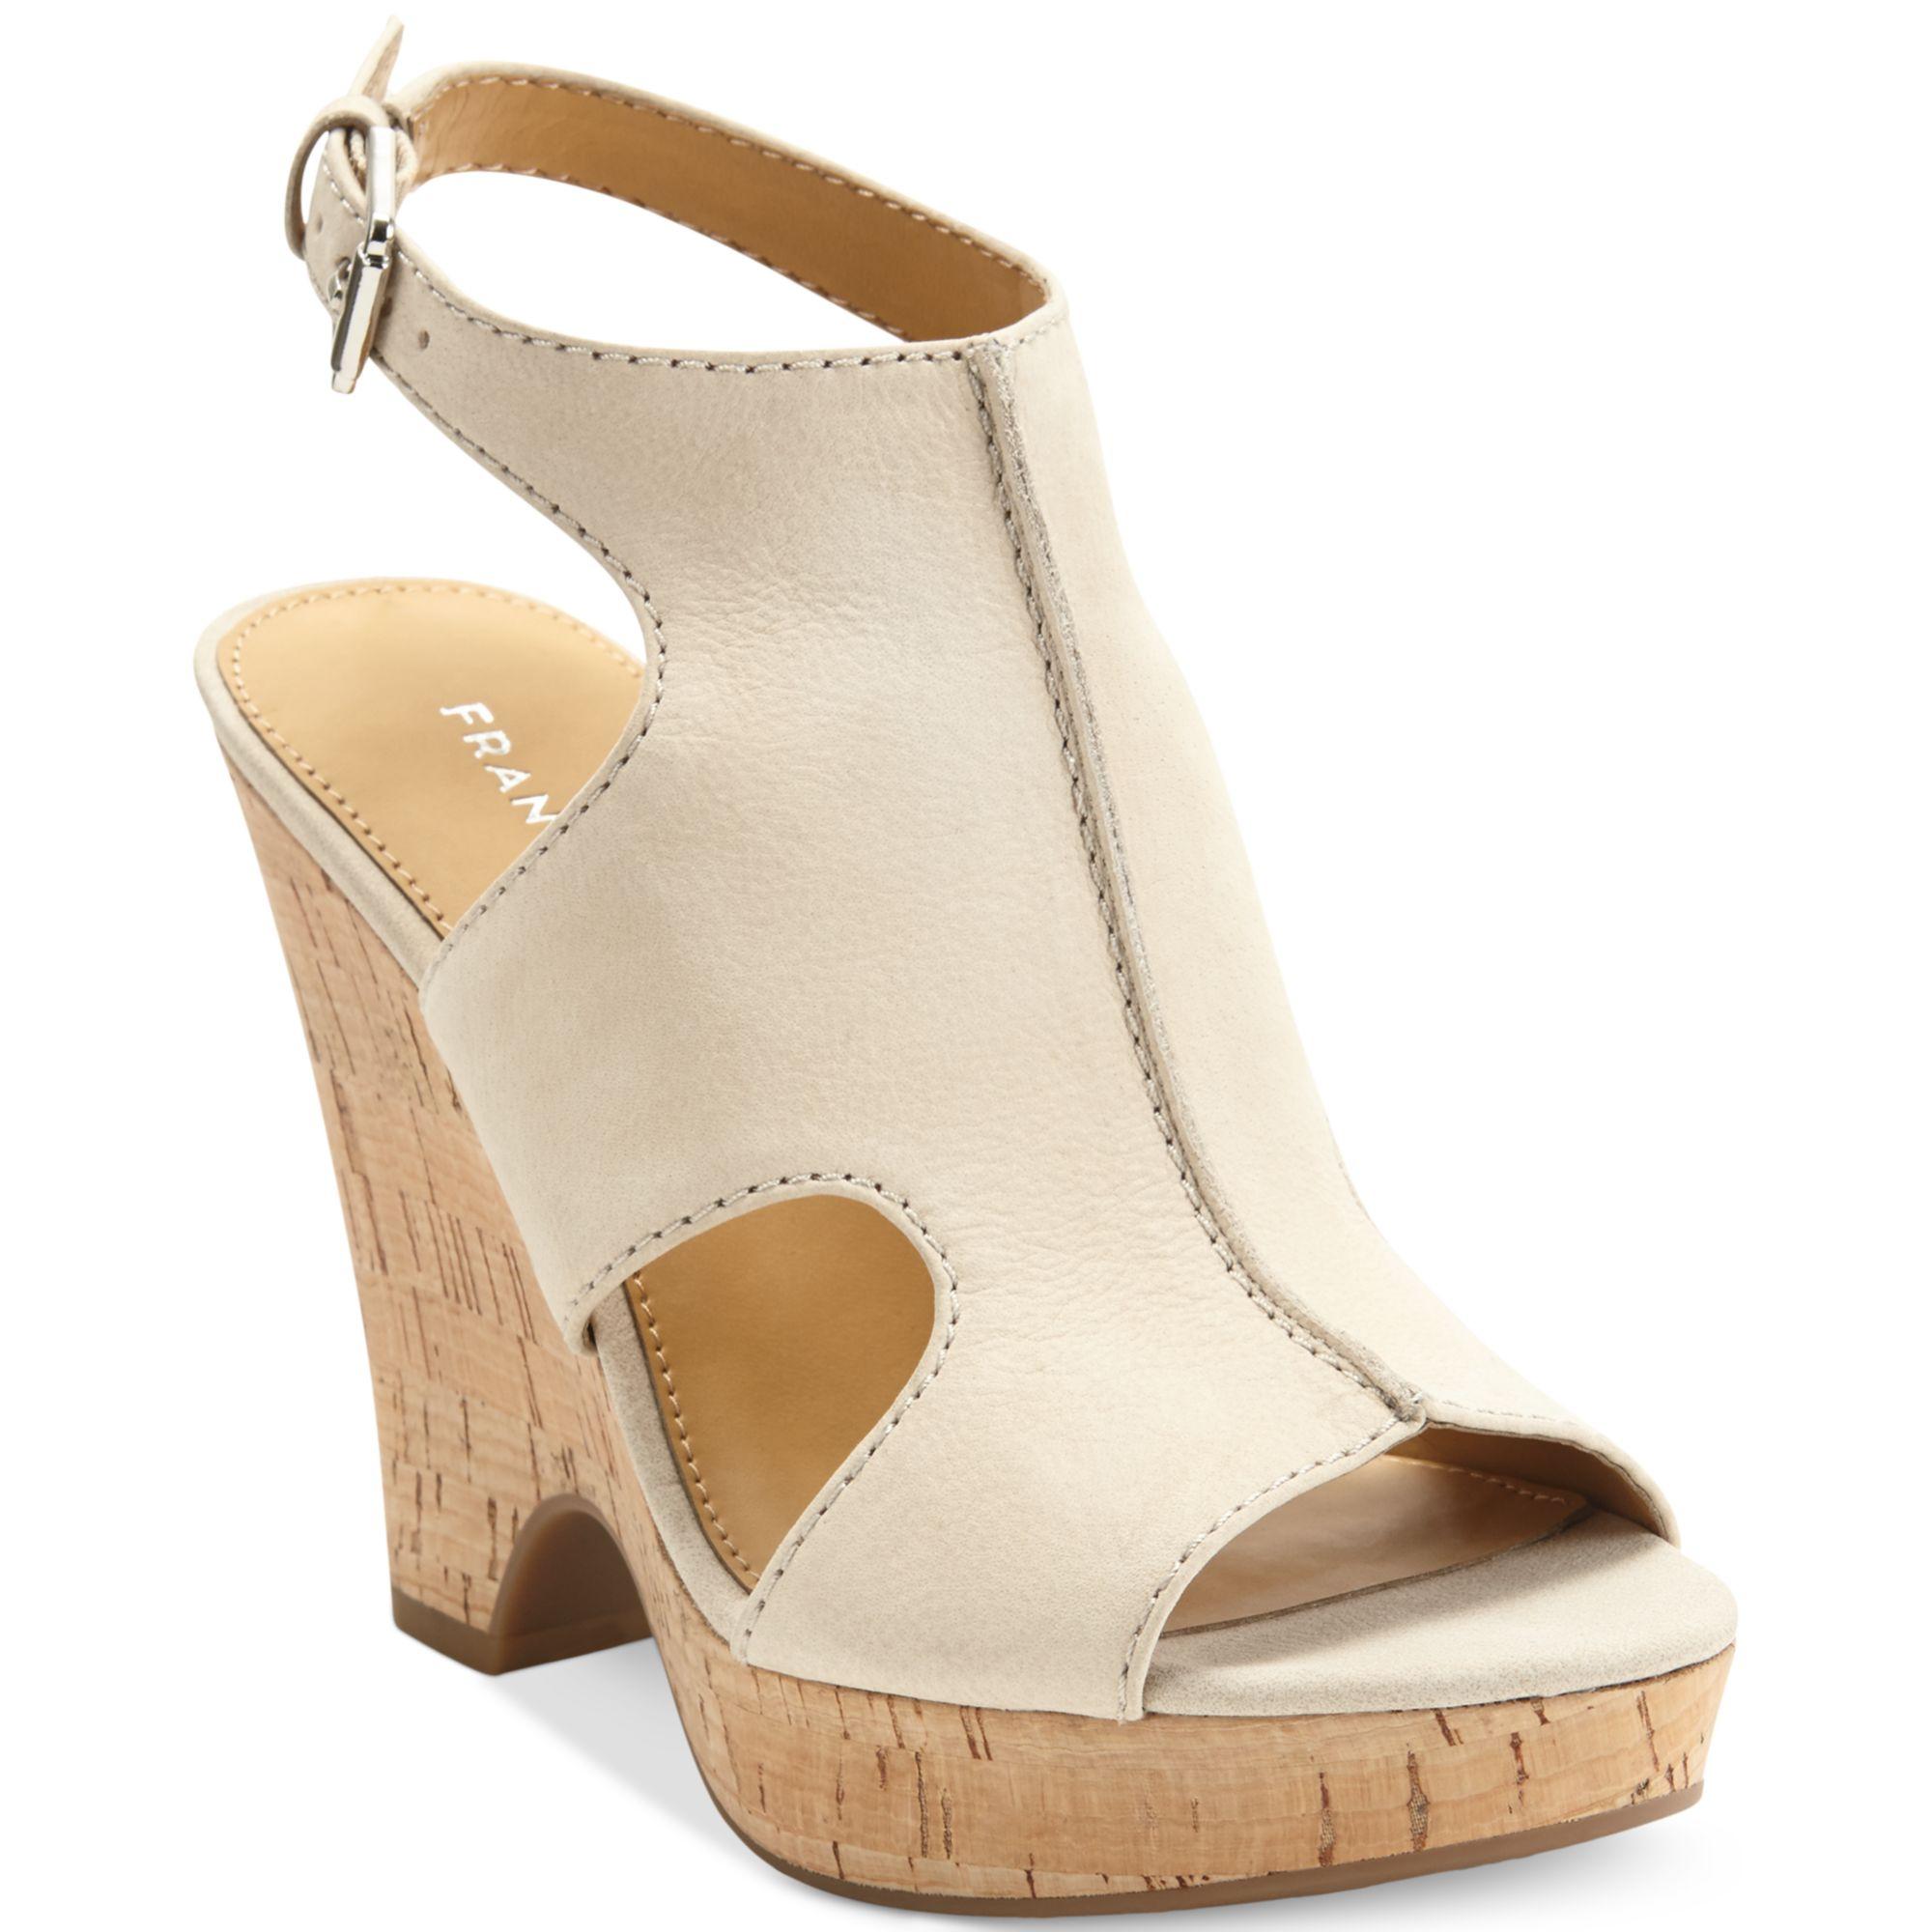 Lyst Franco Sarto Glamour Platform Wedge Sandals In Natural